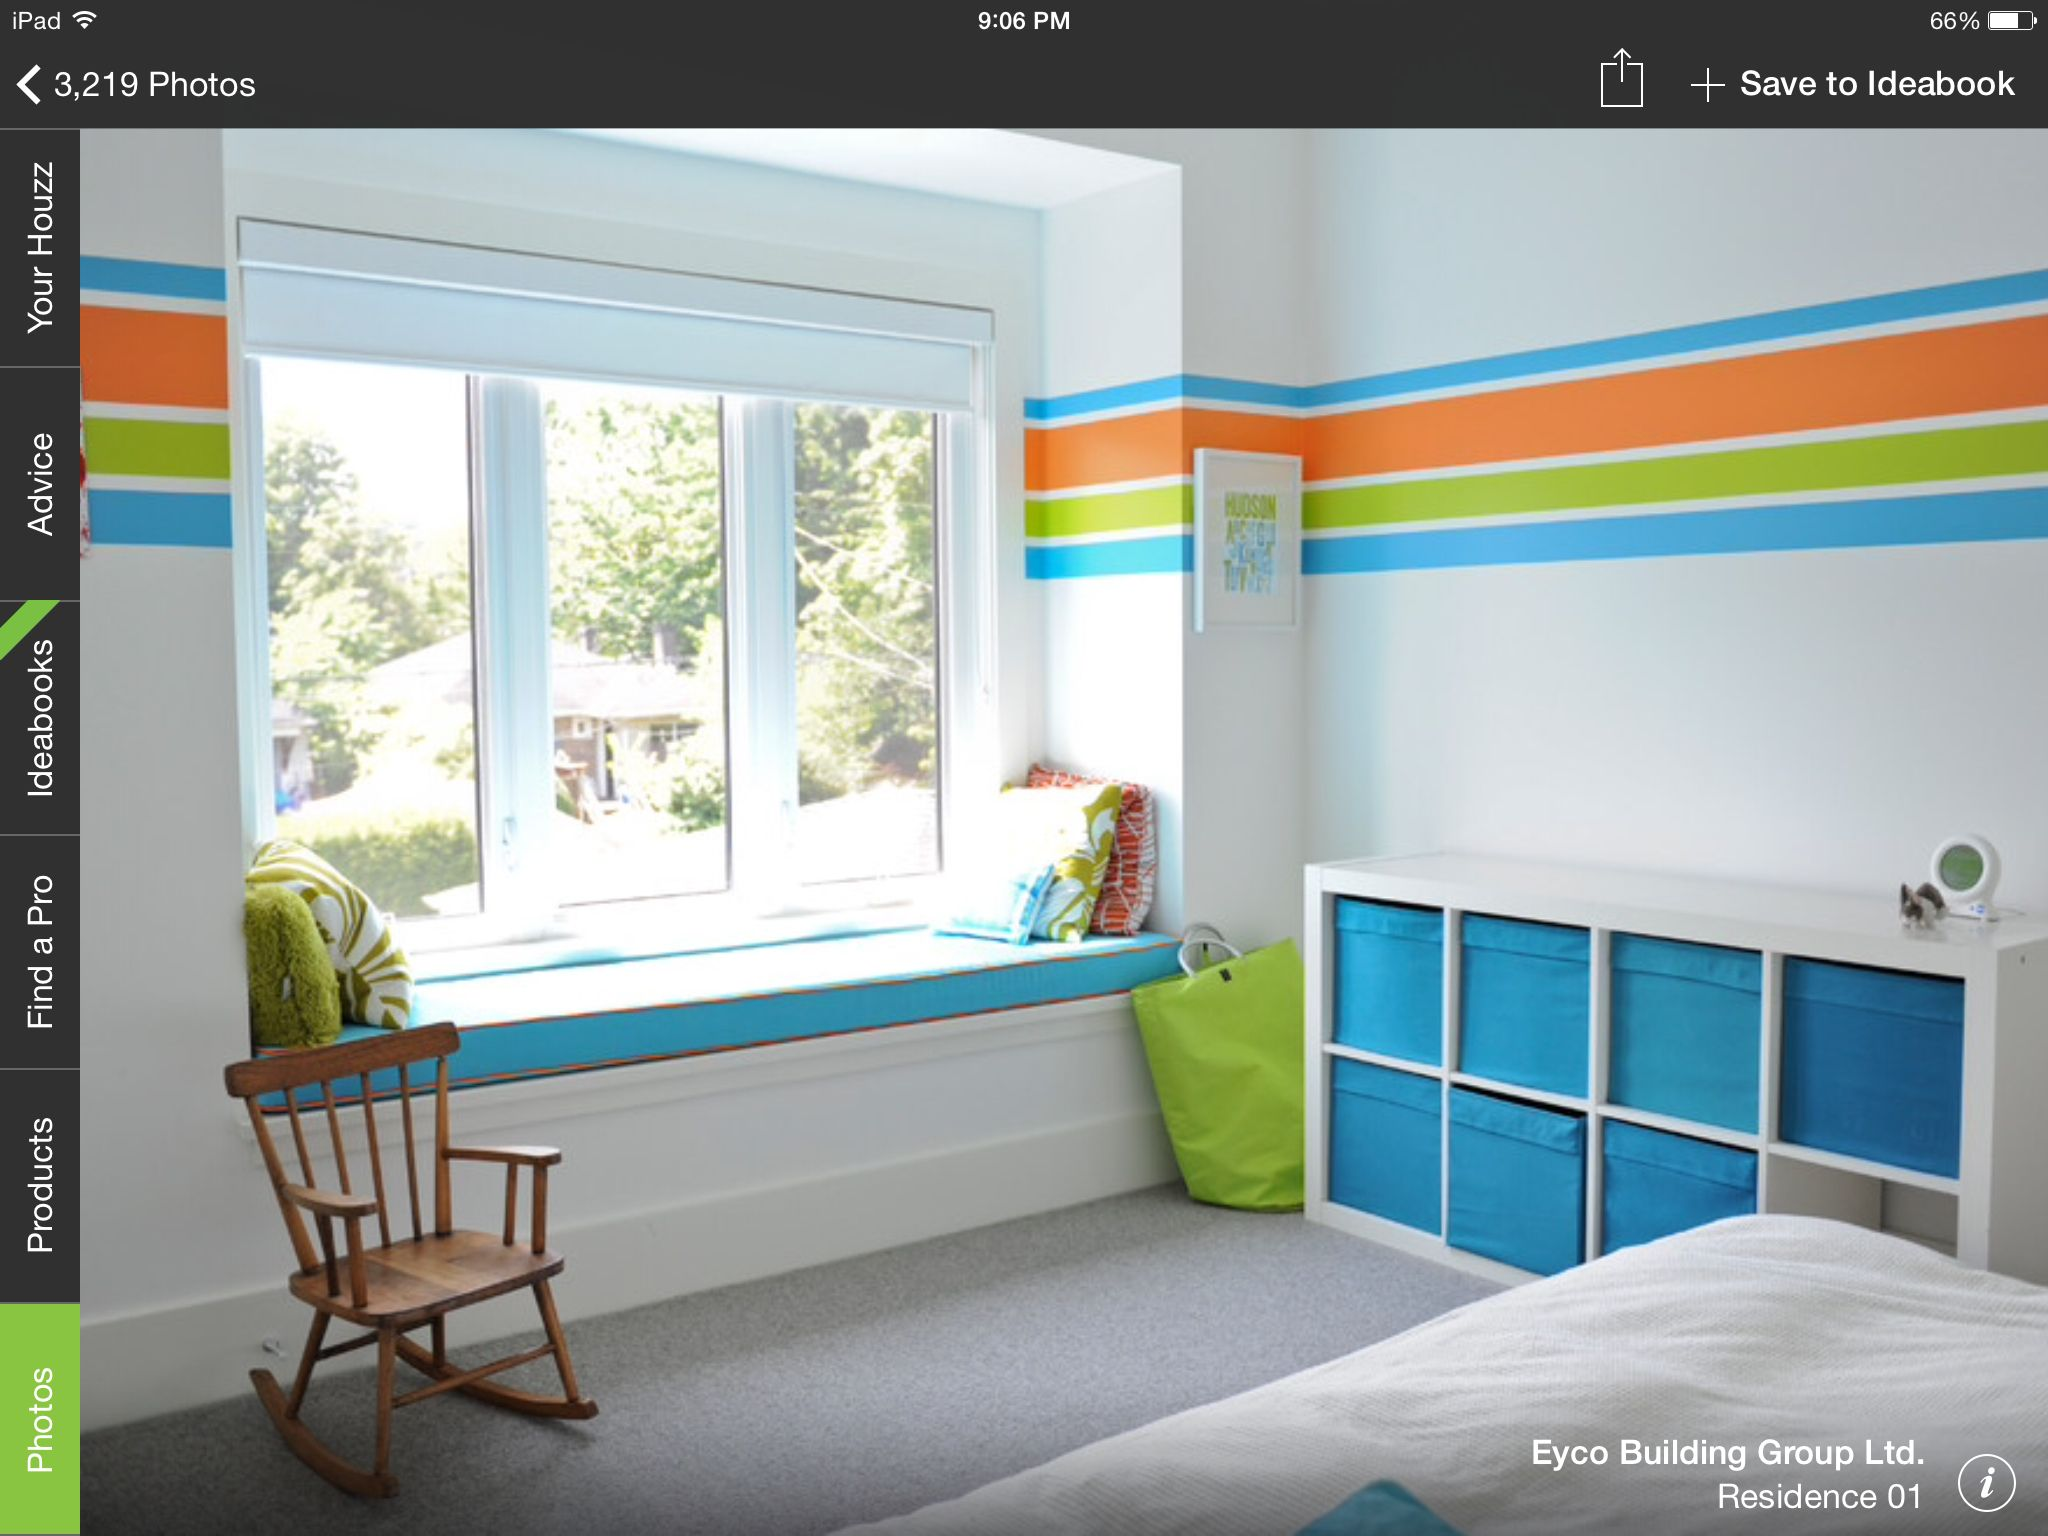 Classroom Wall Ideas : Love the stripes on wall pre k sunday school